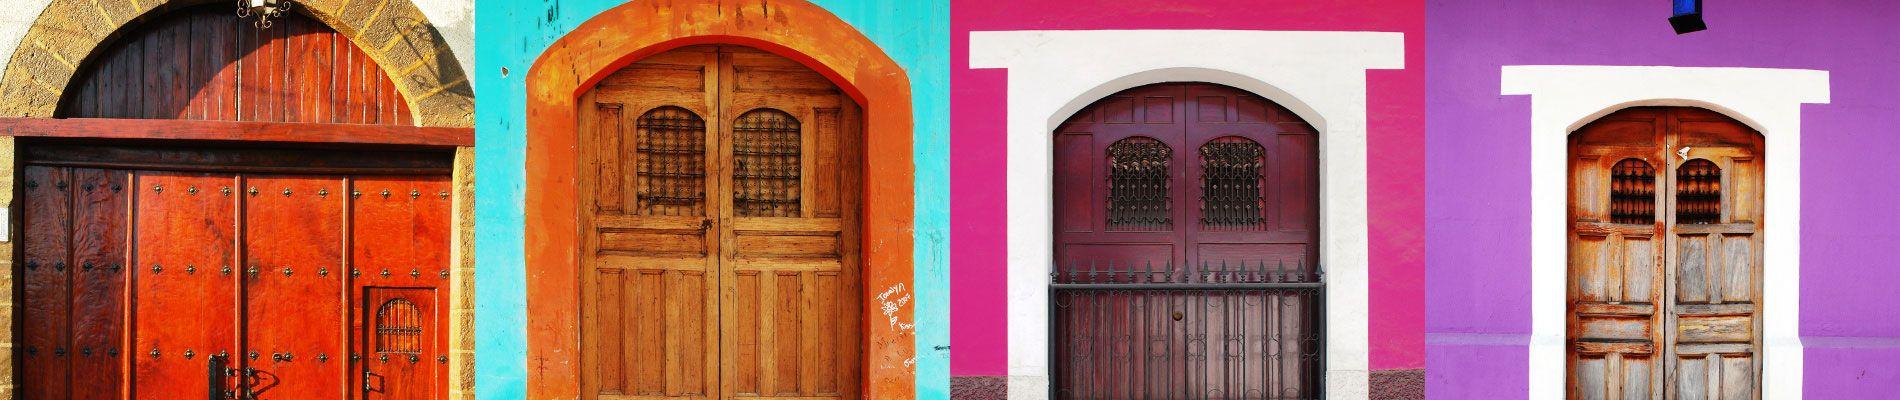 nicaragua-granada-portes-st